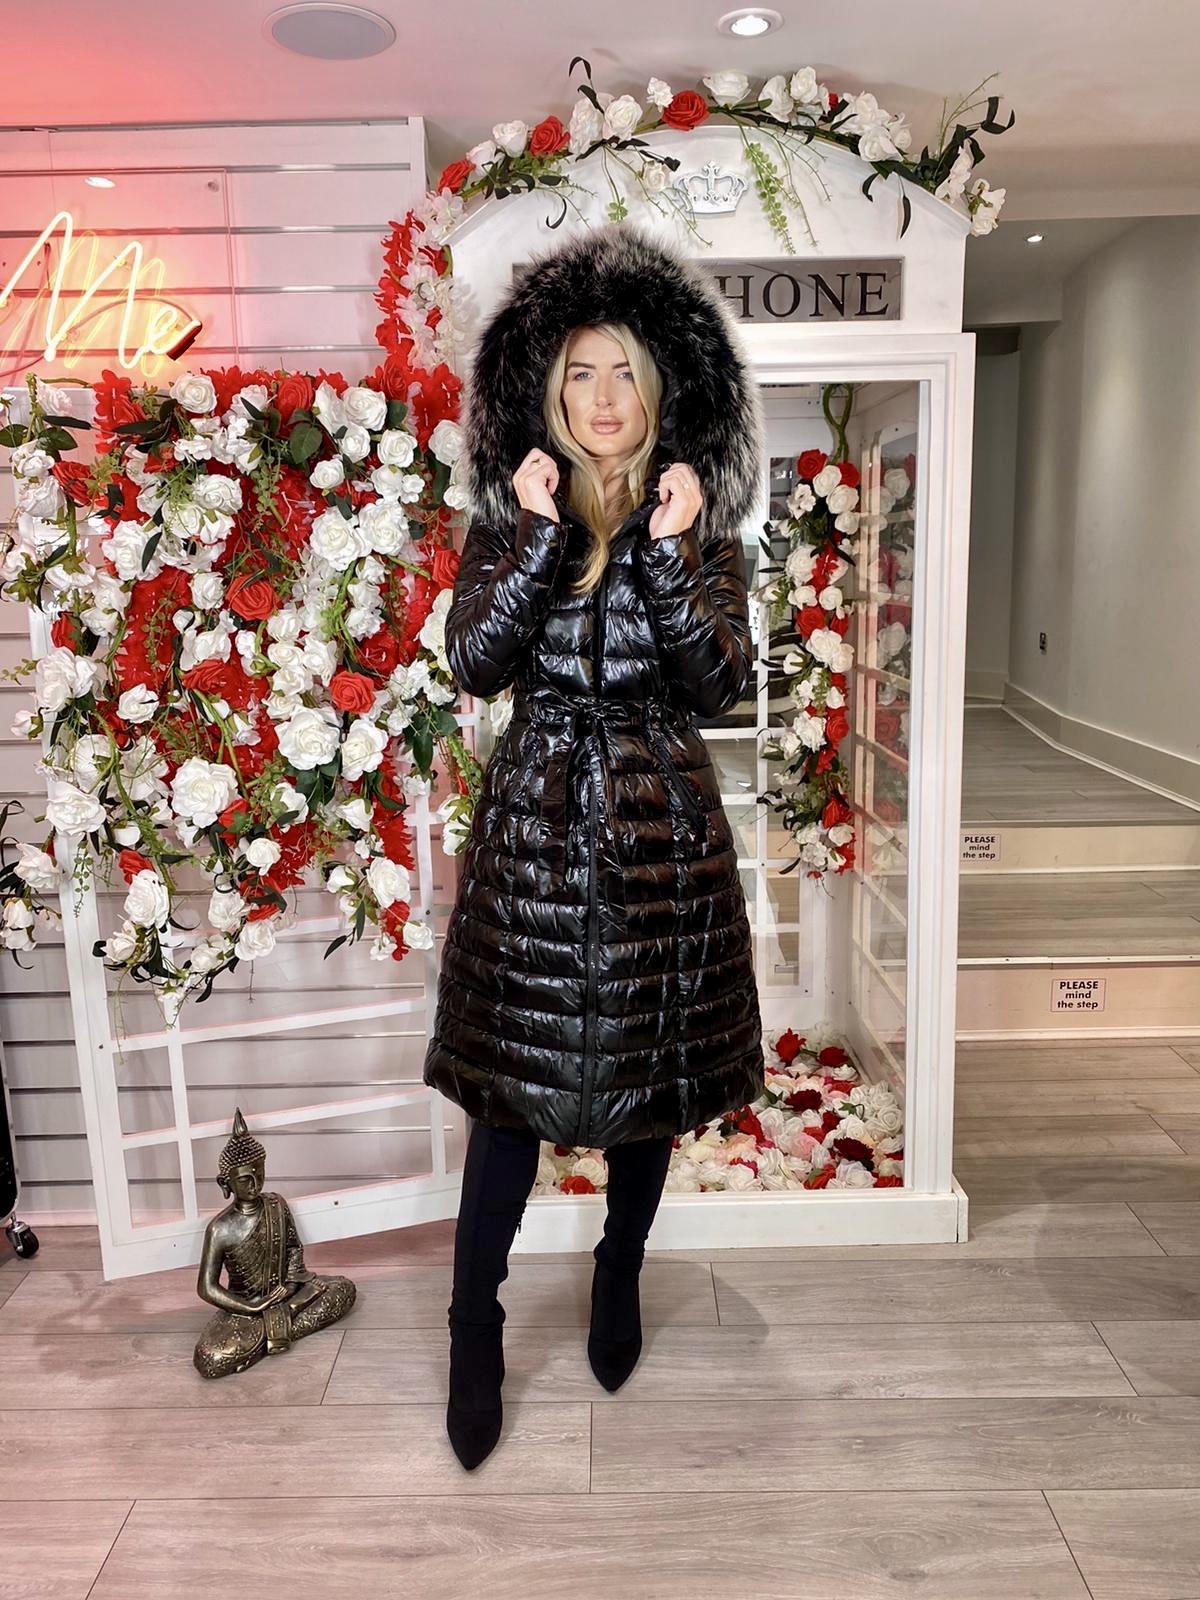 Laura Jane Paris 'Val Thorens' Luxury Xlong Coat in Black with Silver Fox